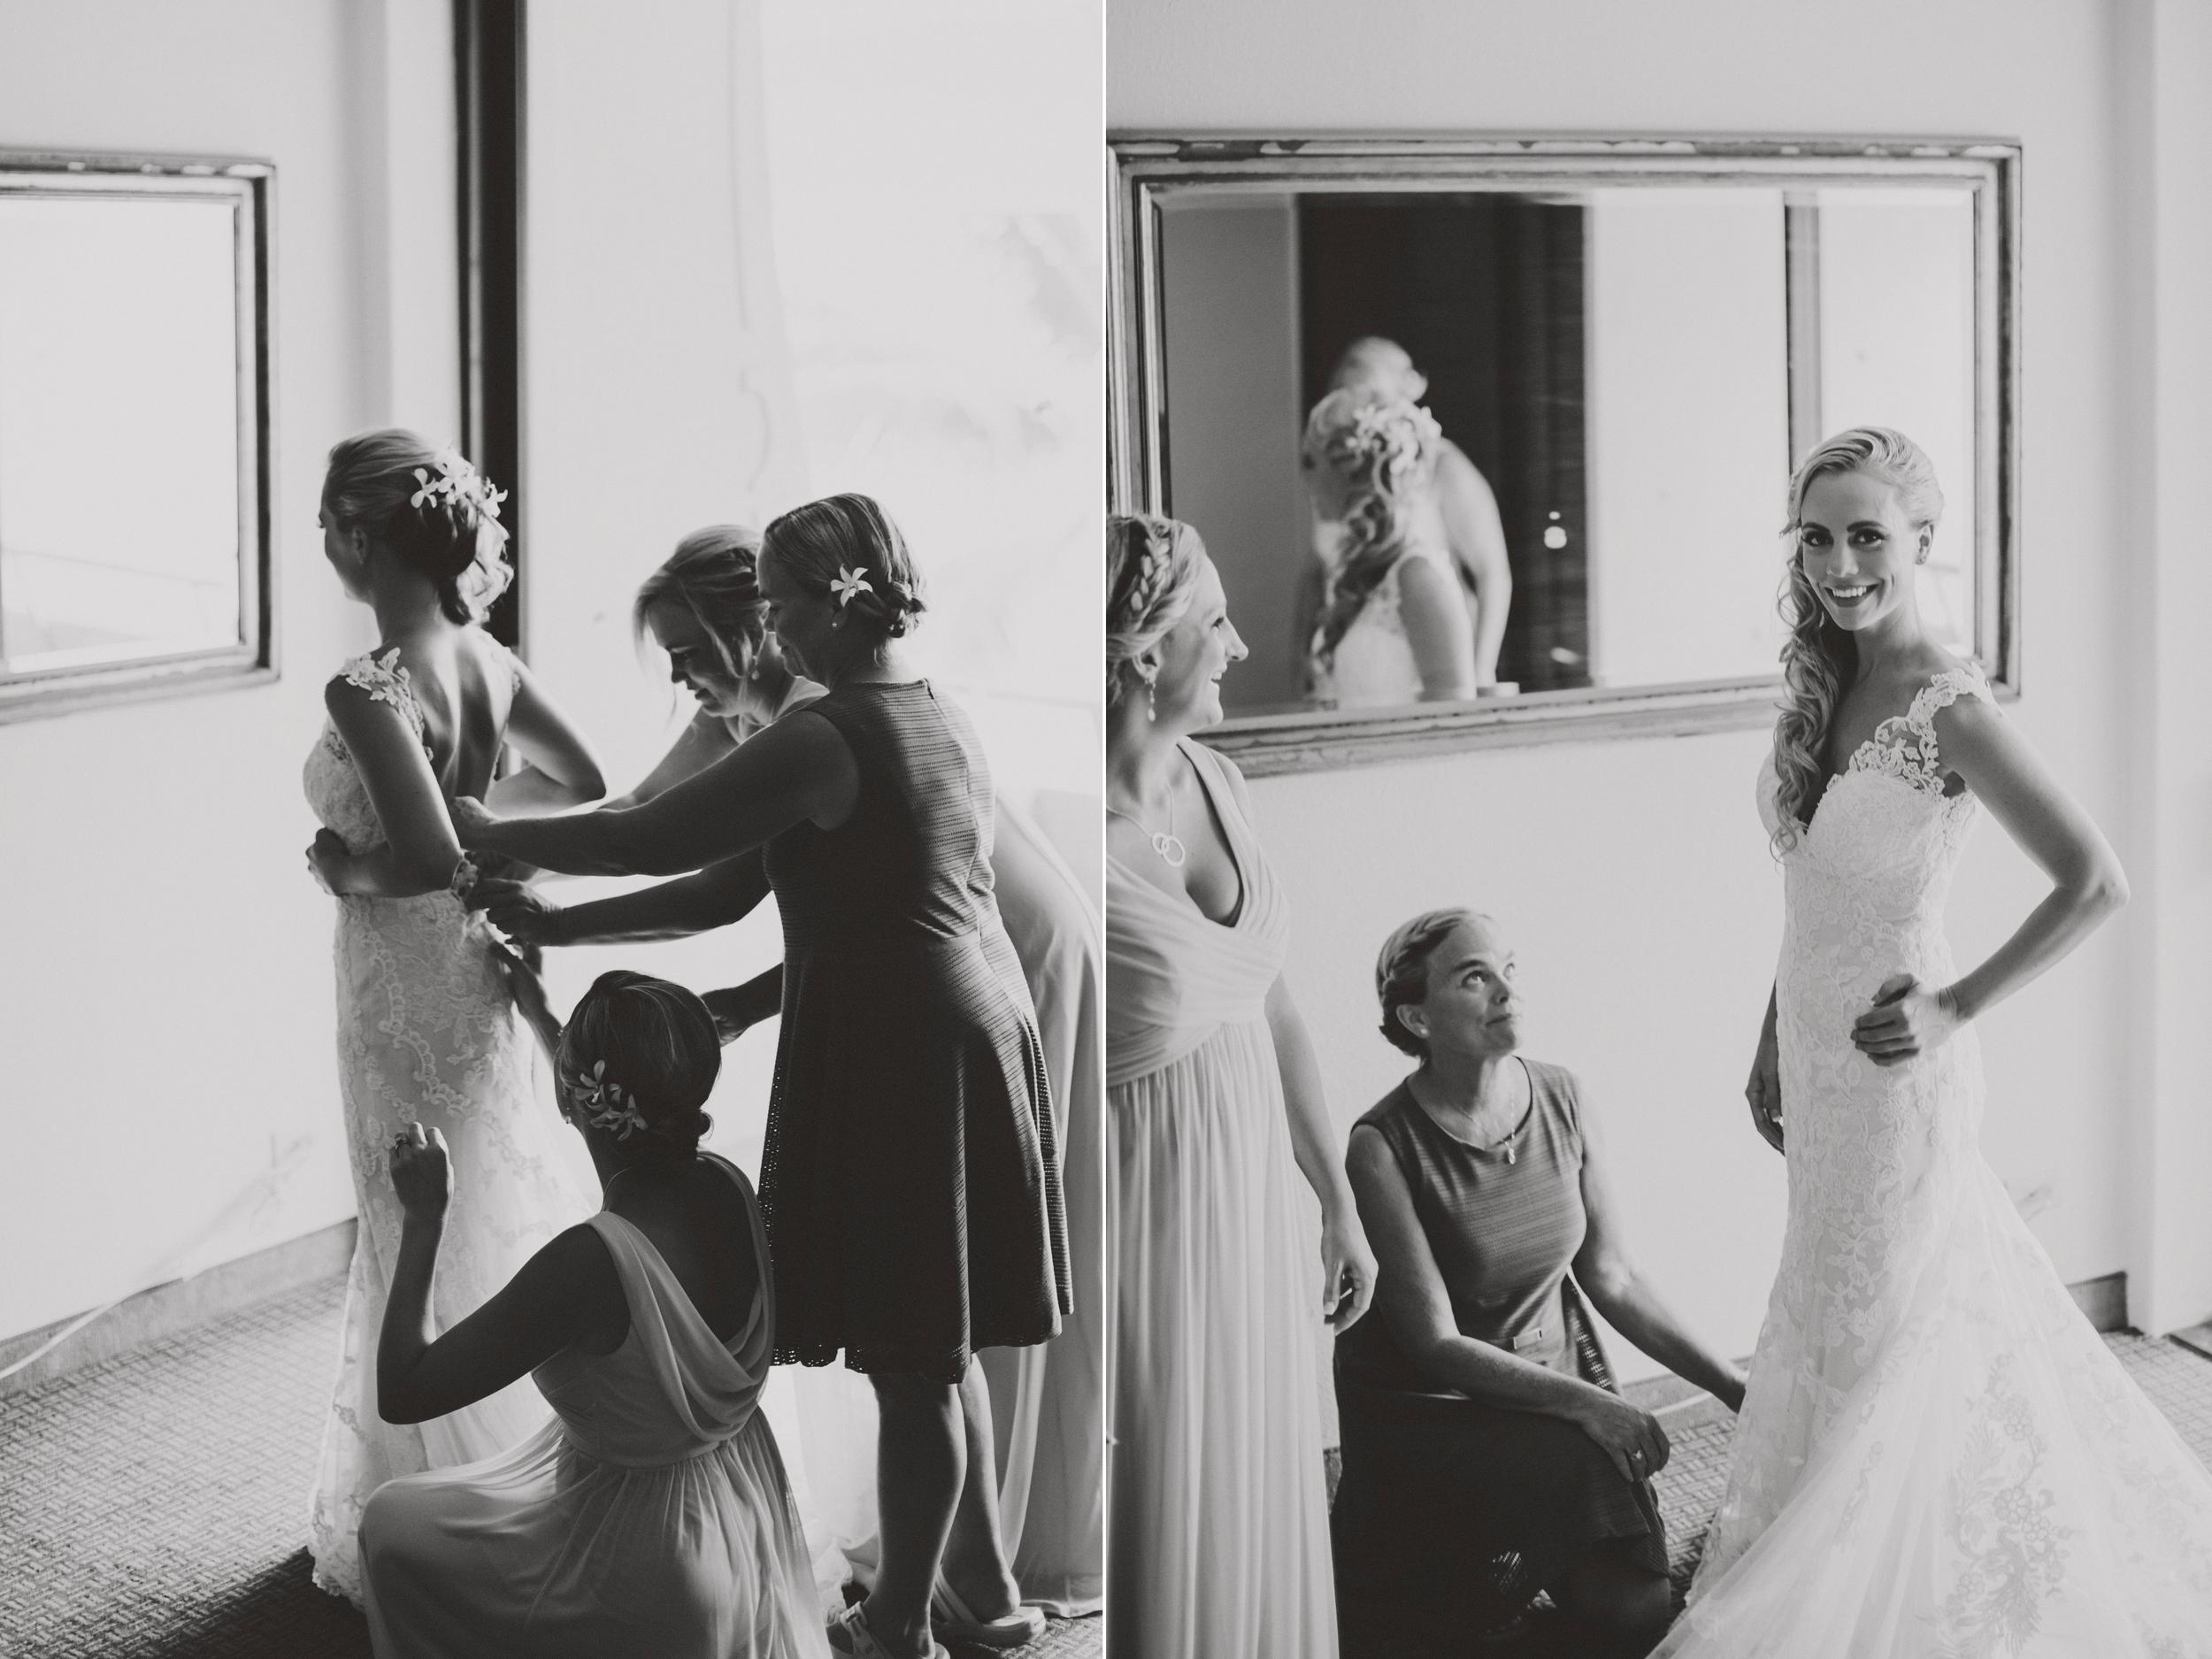 angie-diaz-photography-hawaii-wedding-photographer-kelli-jay-18.jpg